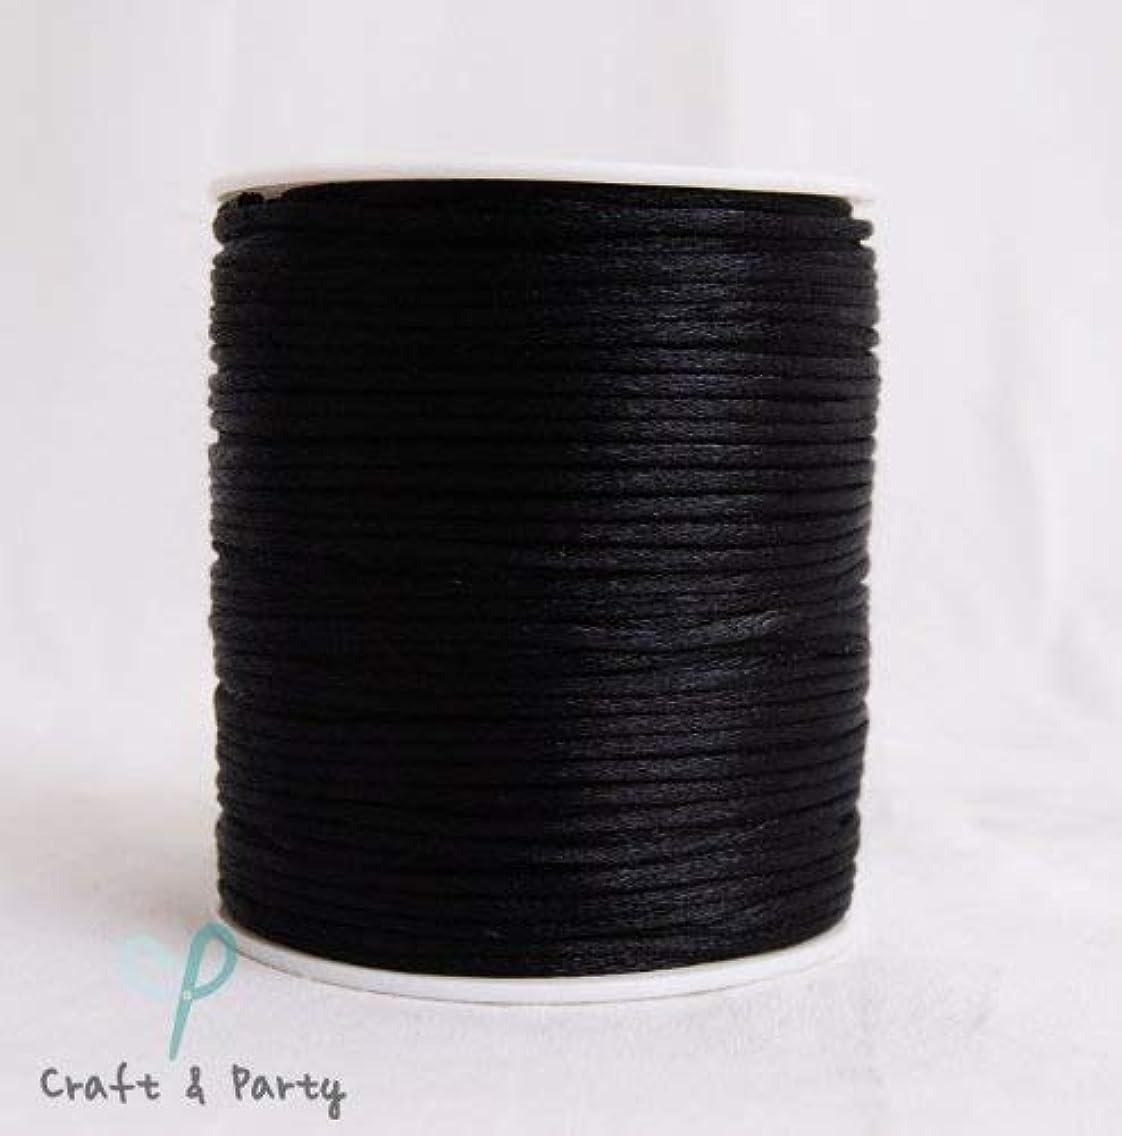 Black 2mm x 100 yards Rattail Satin Nylon Trim Cord Chinese Knot